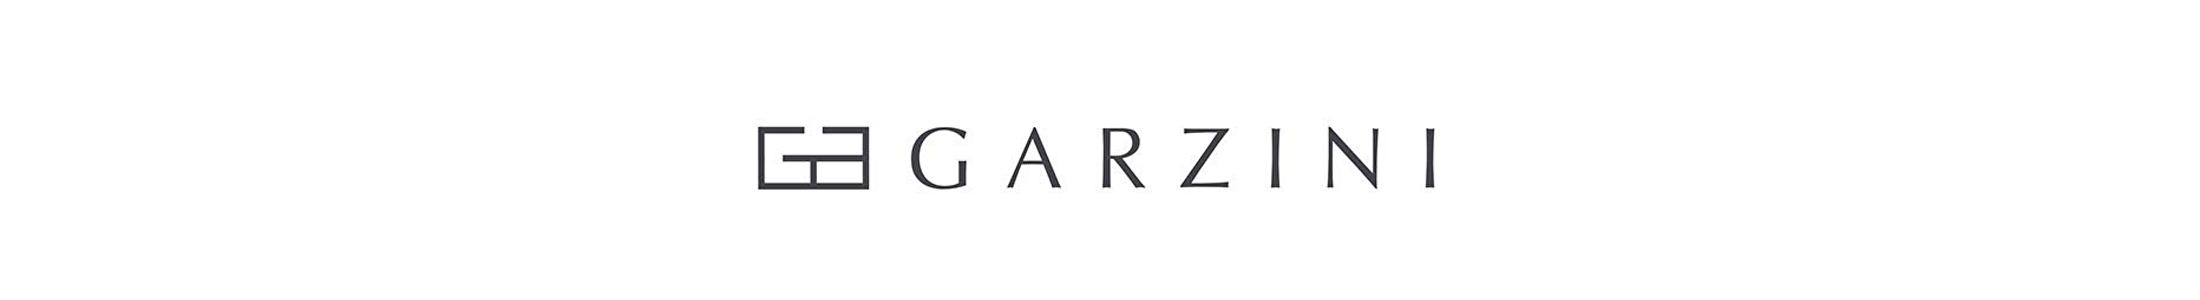 Garzini Logo